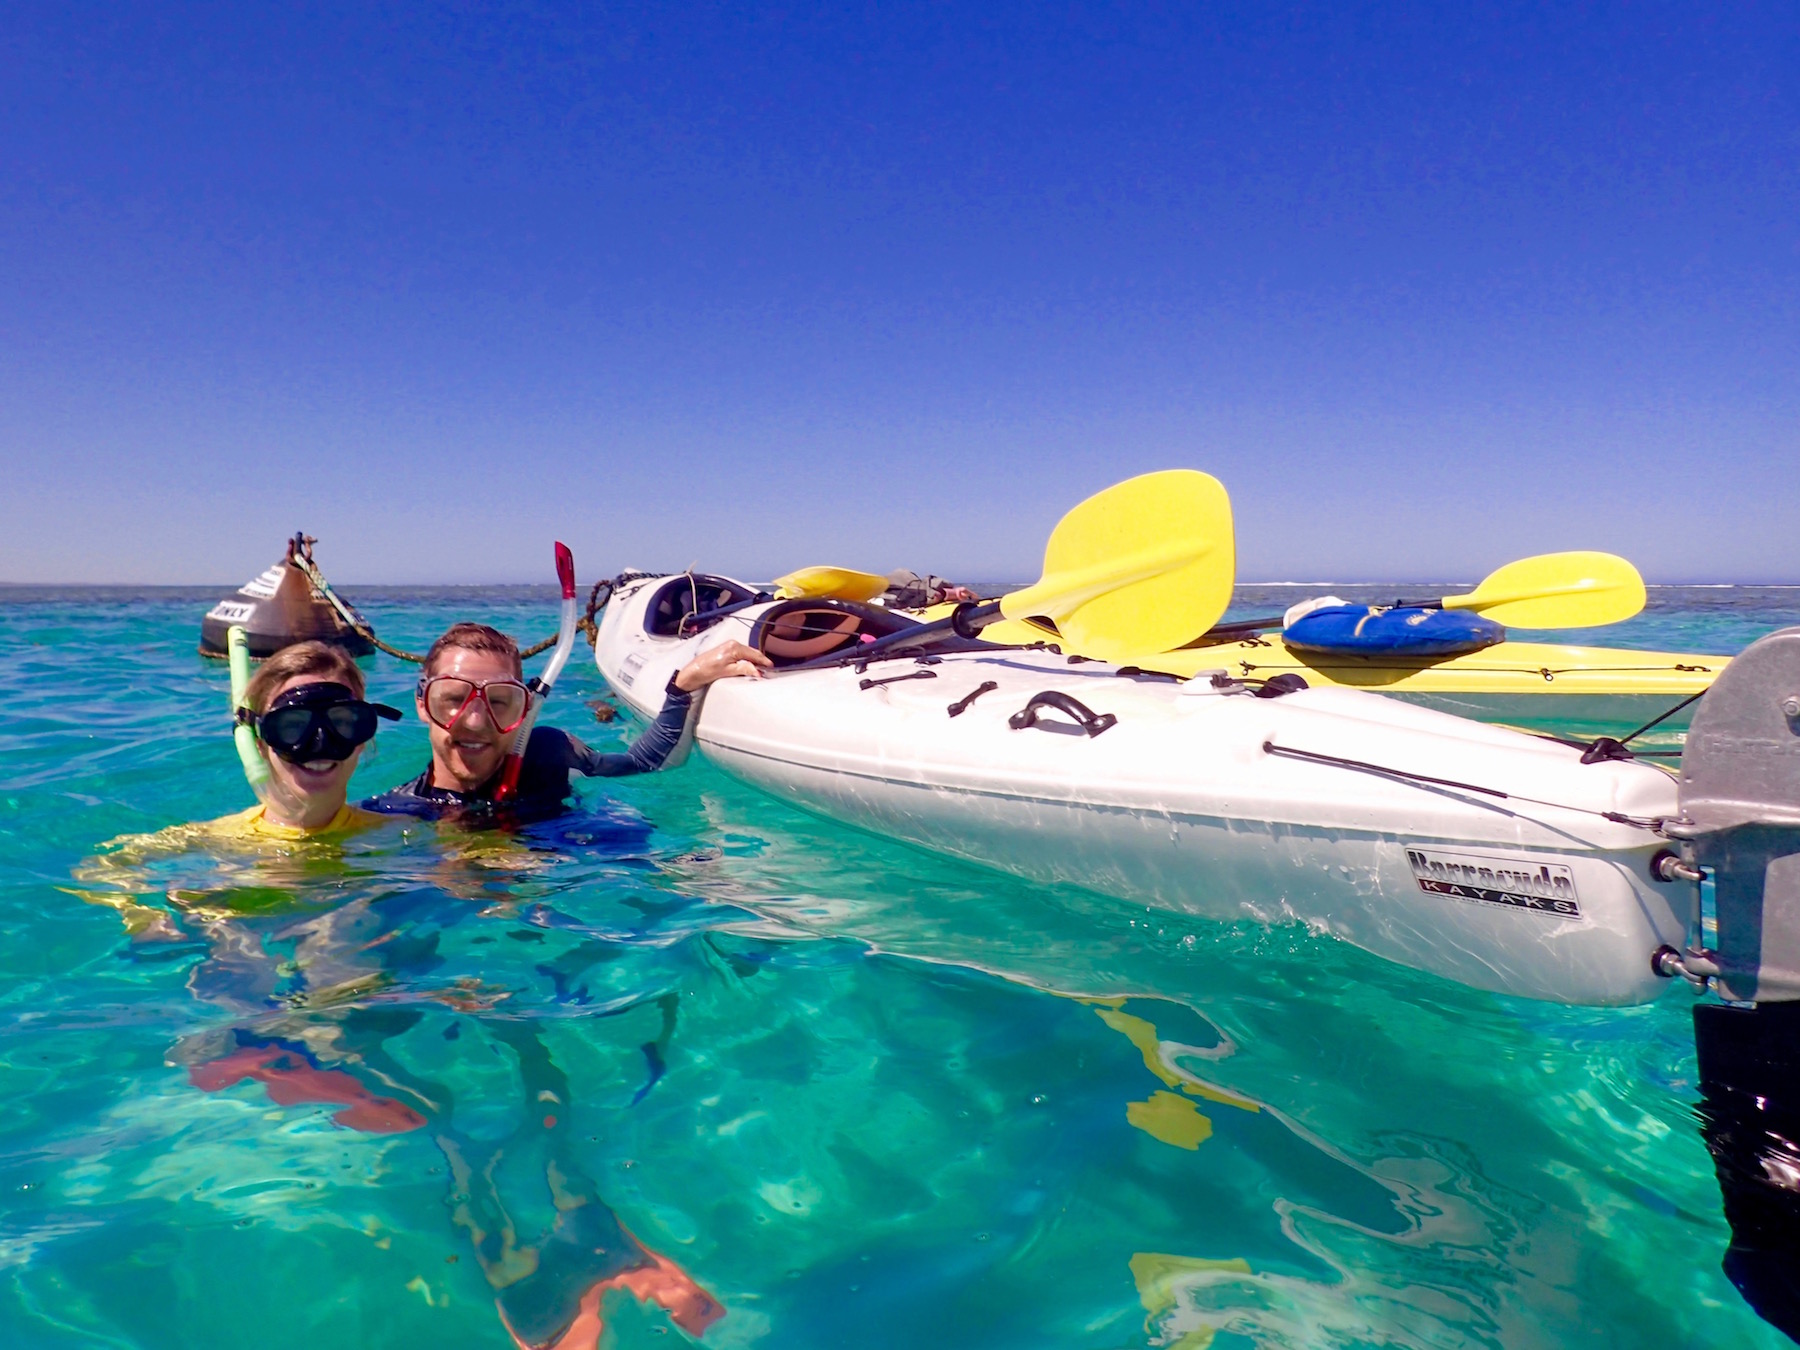 Sea kayak, Snorkel, Eco Tour, Ningaloo Reef, Exmouth, Western Australia, Cape Range National Park